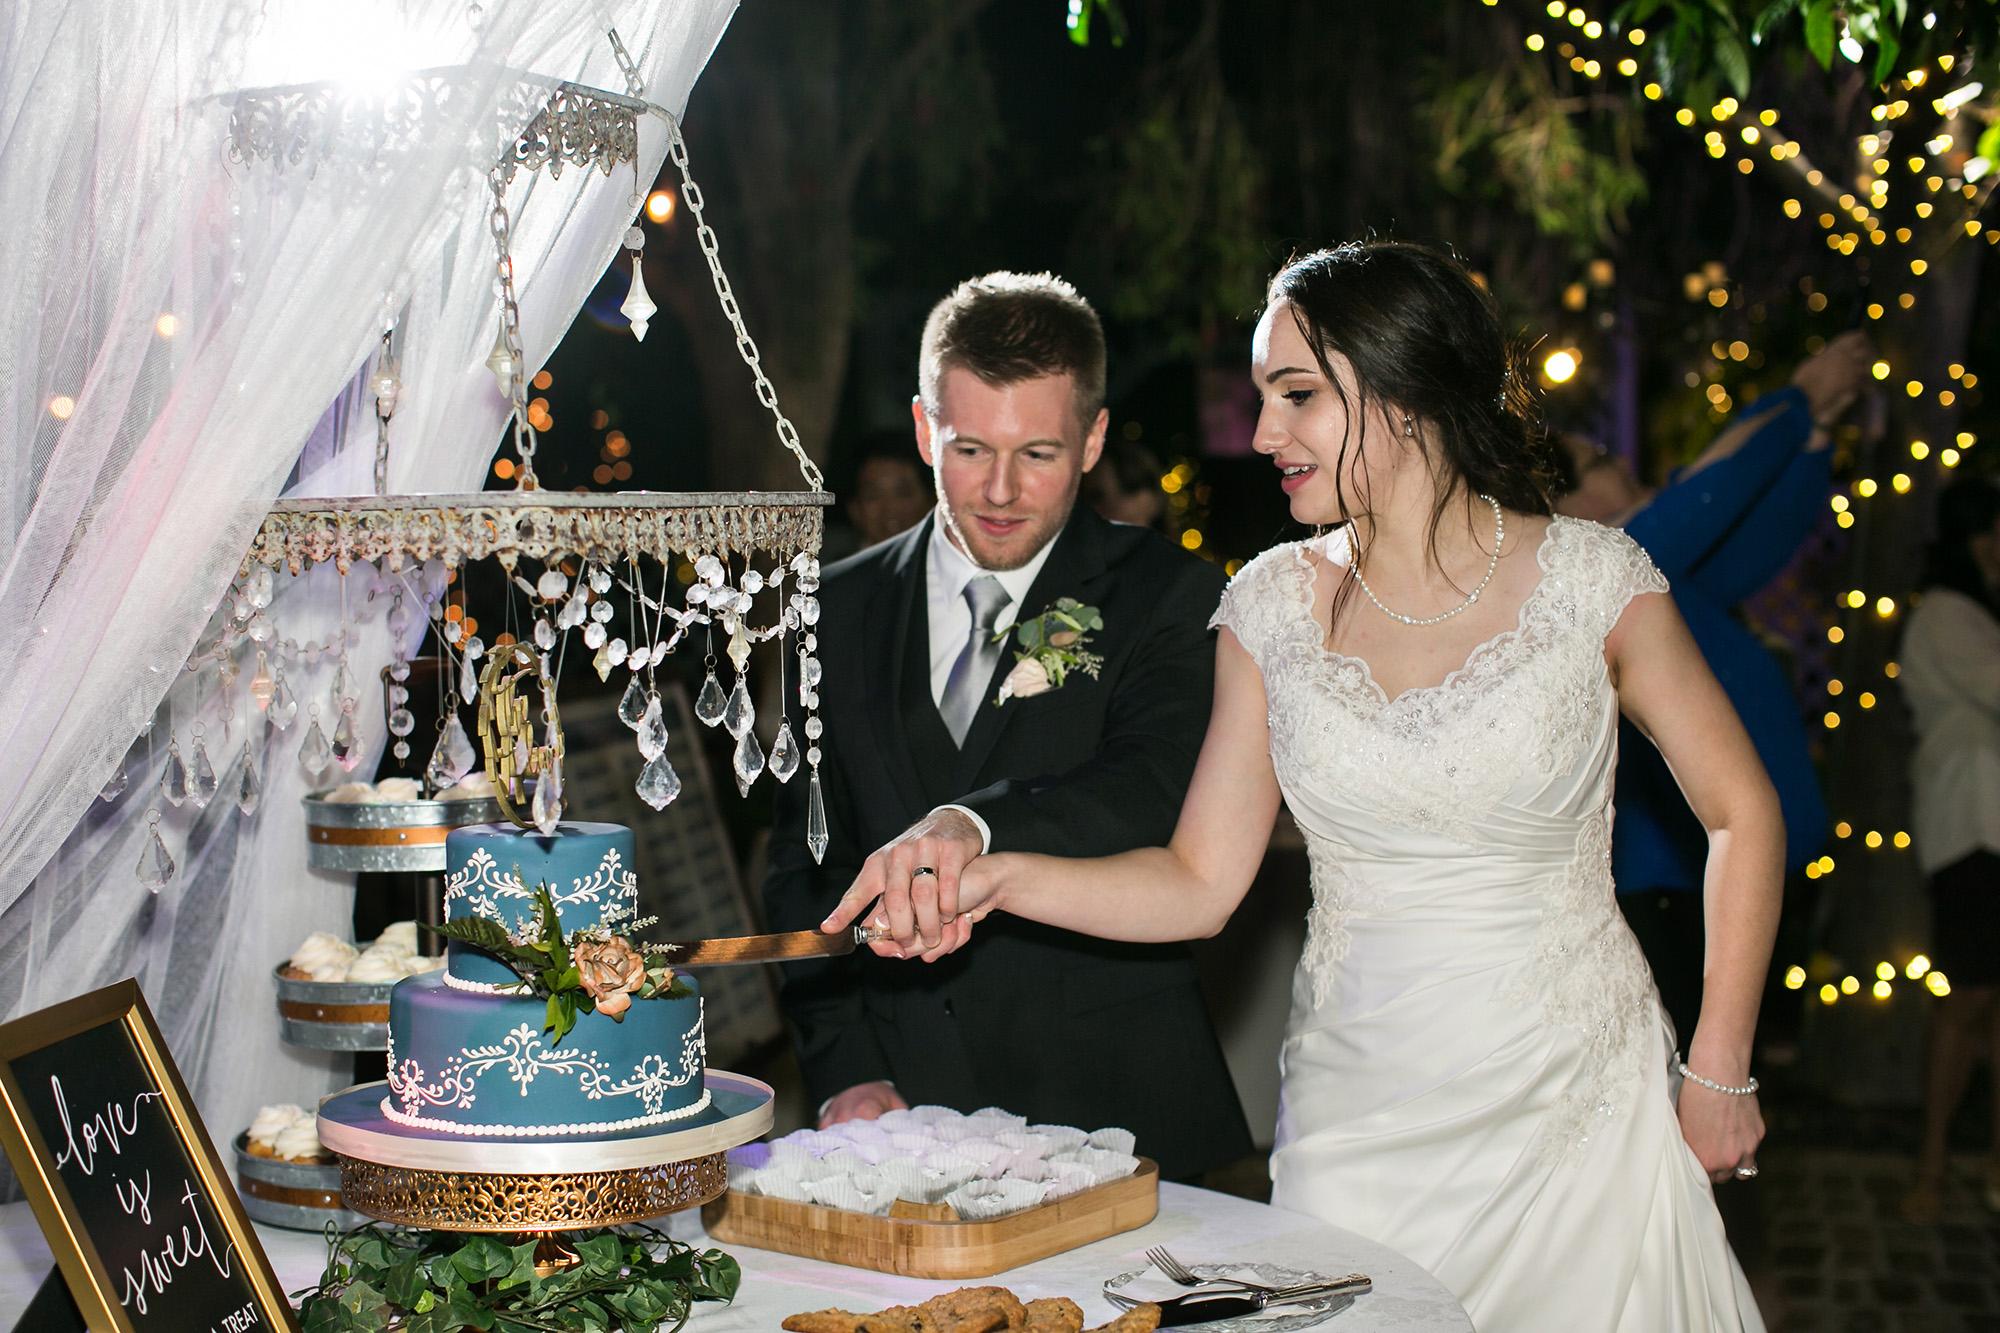 associate-photographer-christmas-house-wedding-carrie-vines-0078.jpg